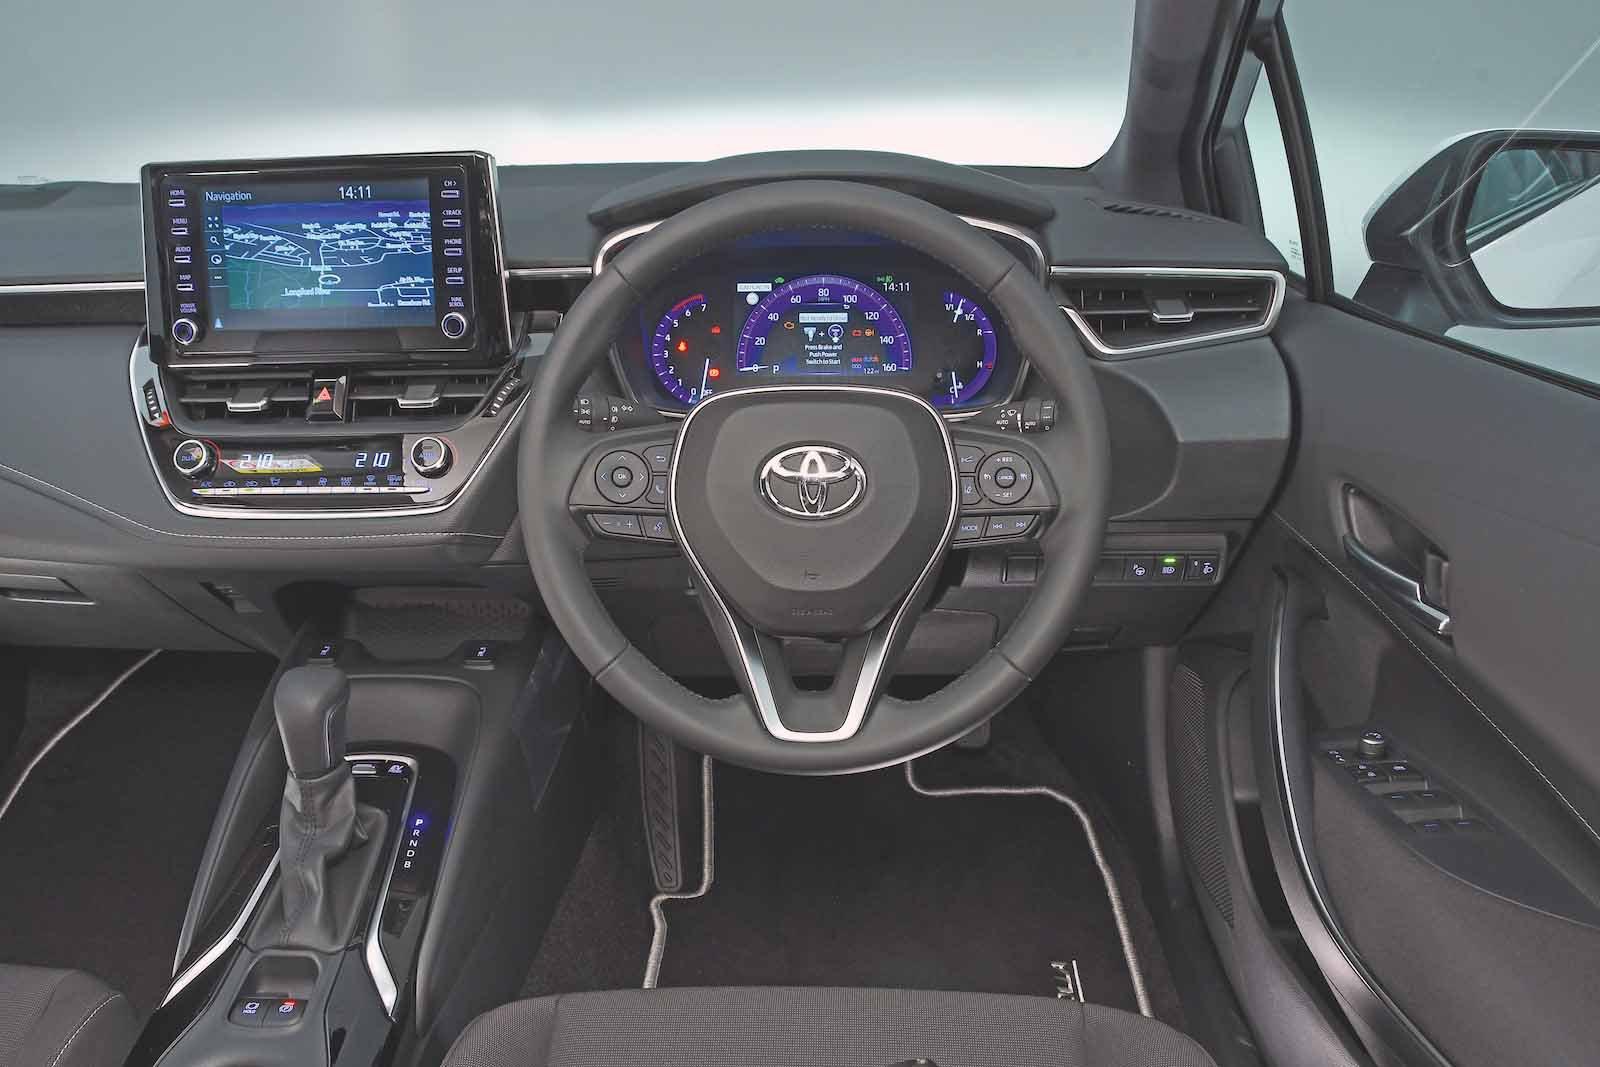 Toyota Corolla 1.8 Hybrid Icon Tech CVT - interior